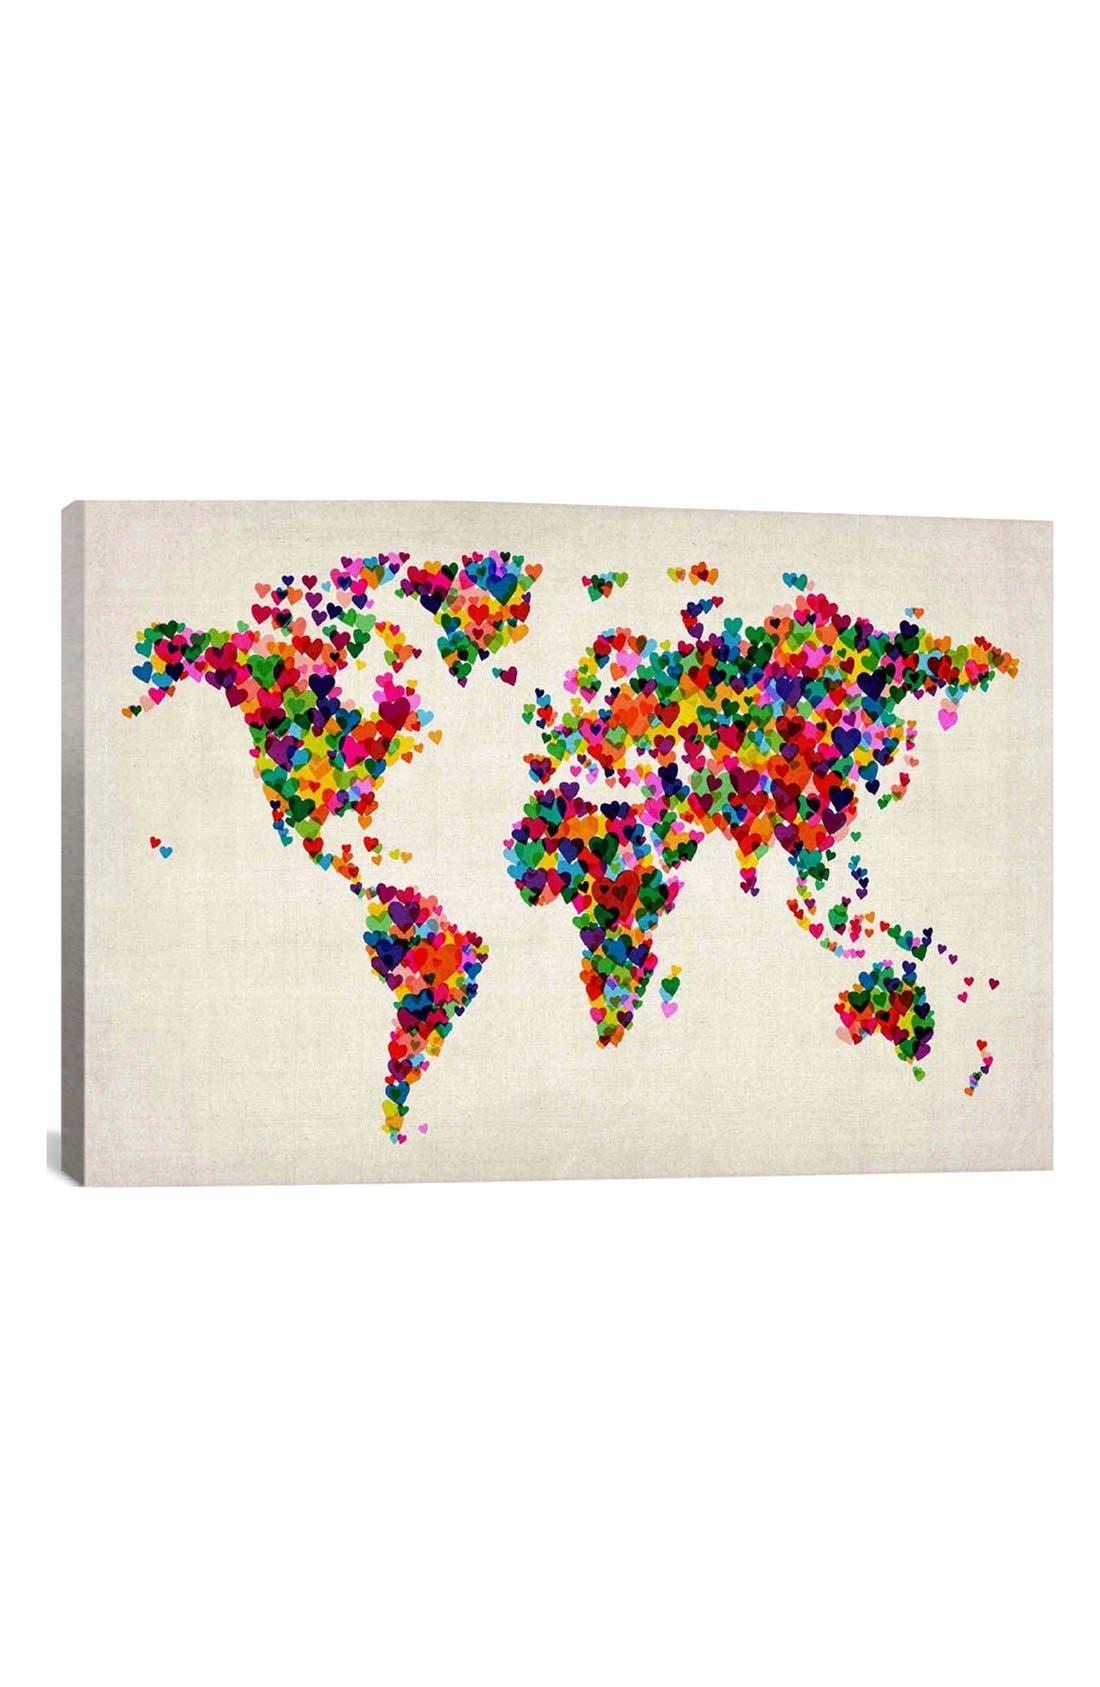 Main Image - iCanvas 'World Map Hearts - Michael Thompsett' Giclée Print Canvas Art